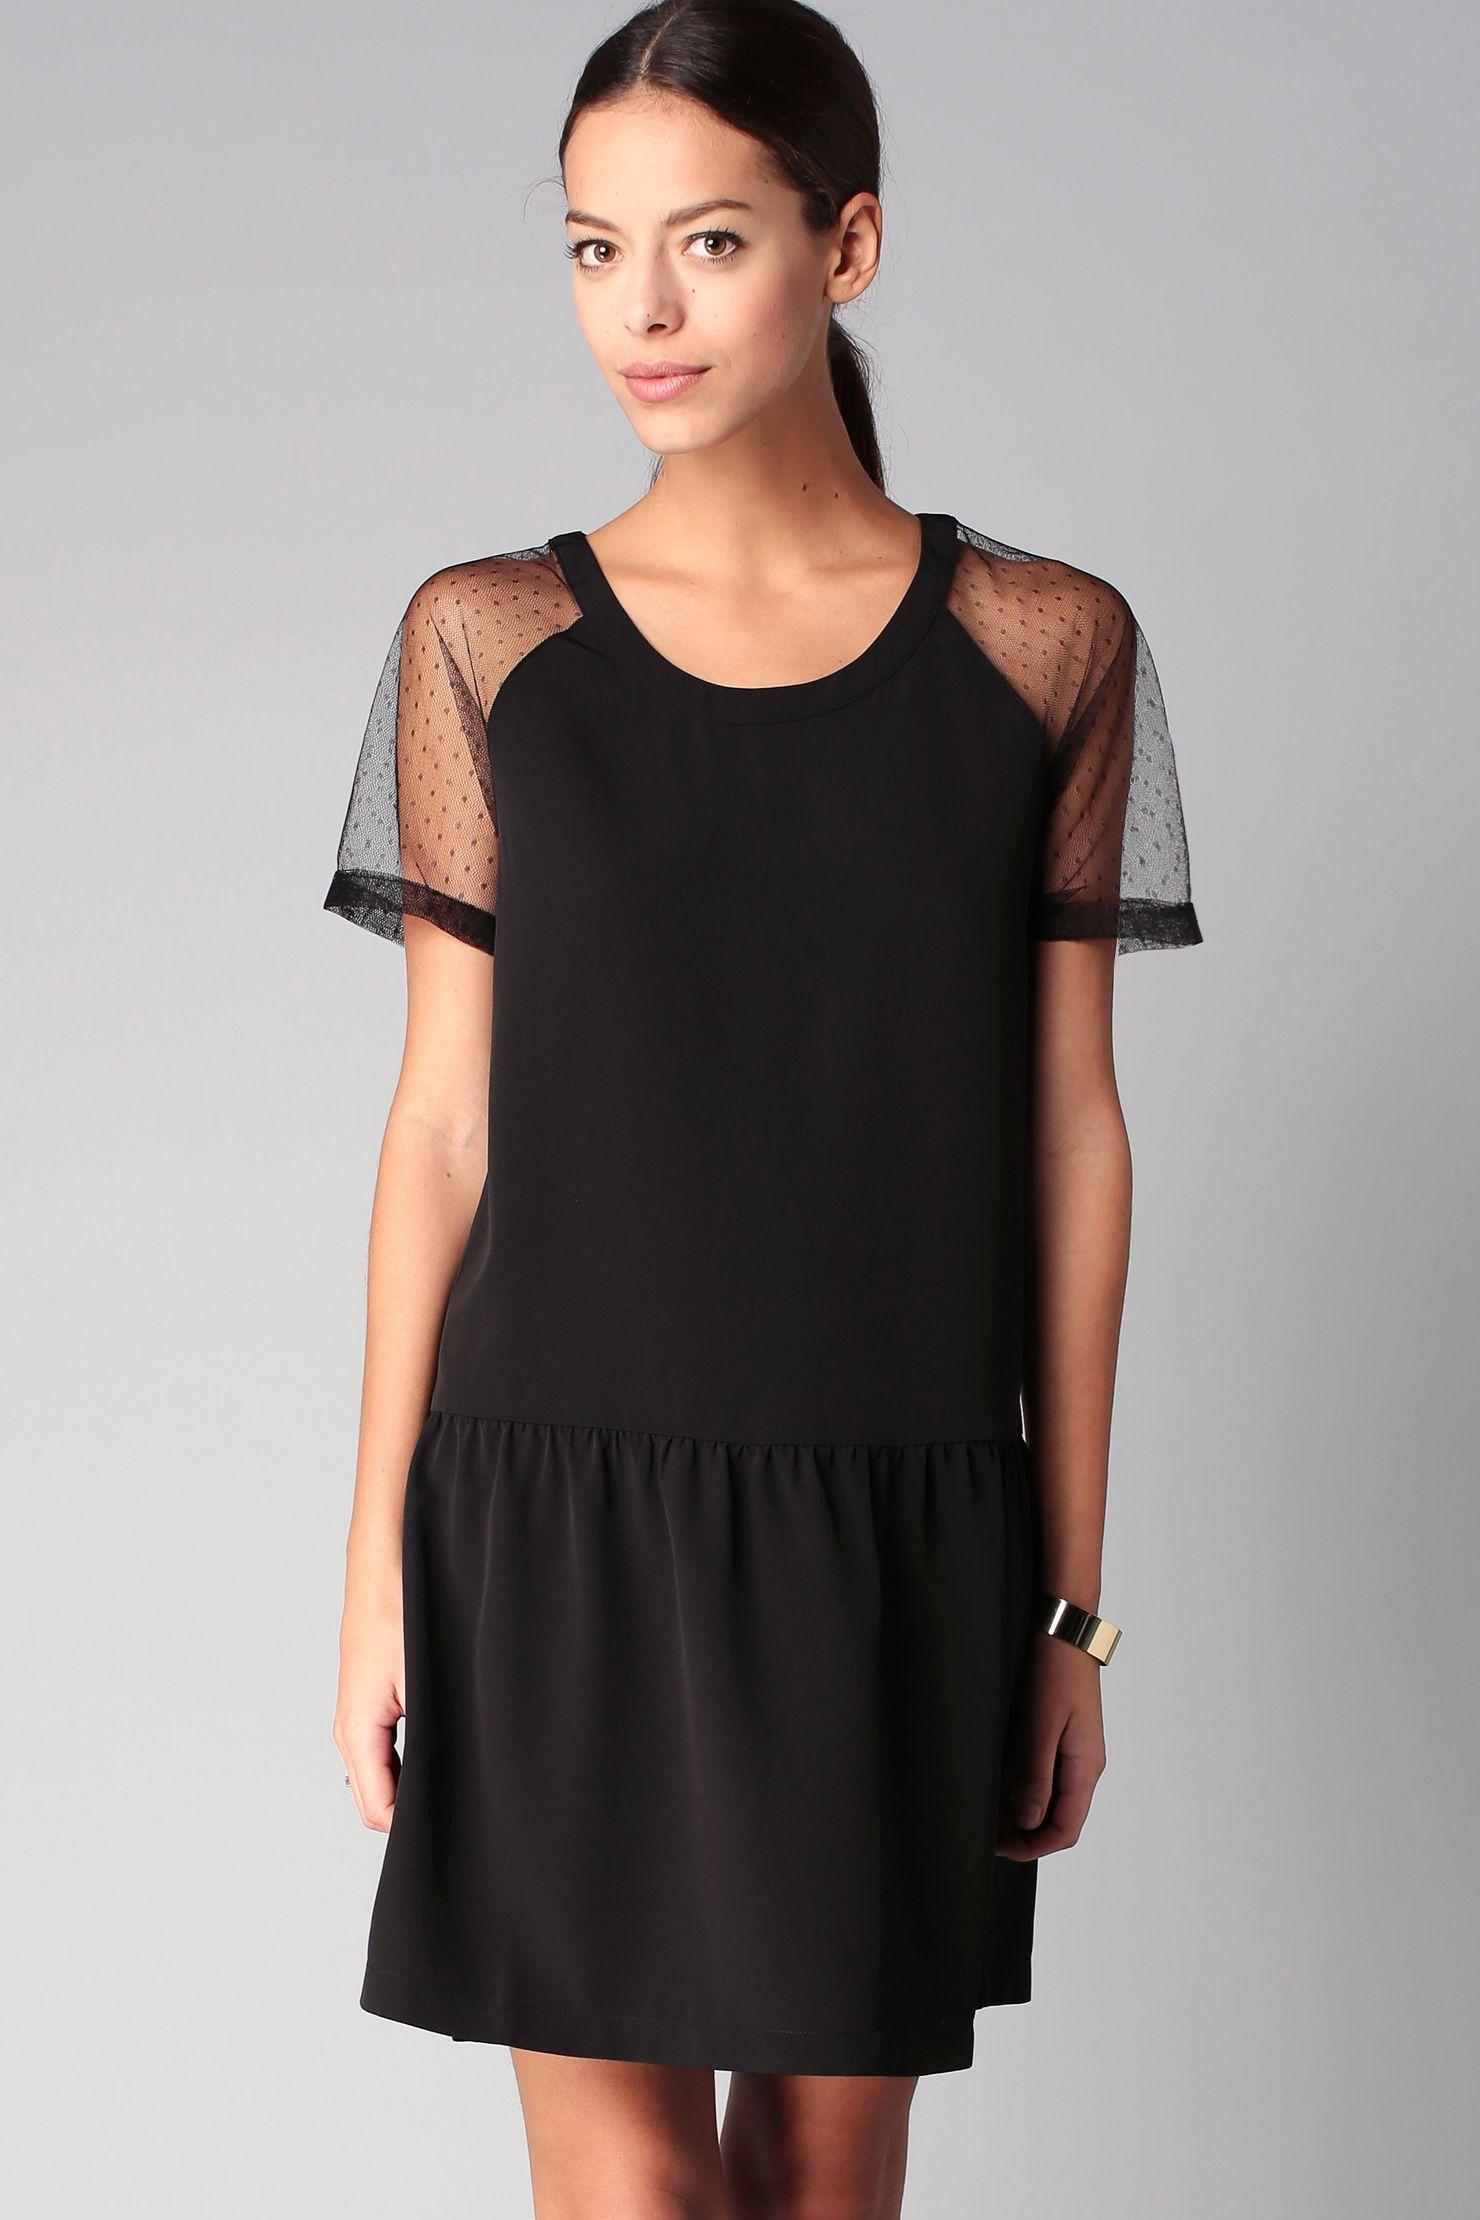 Robe noire plumetis